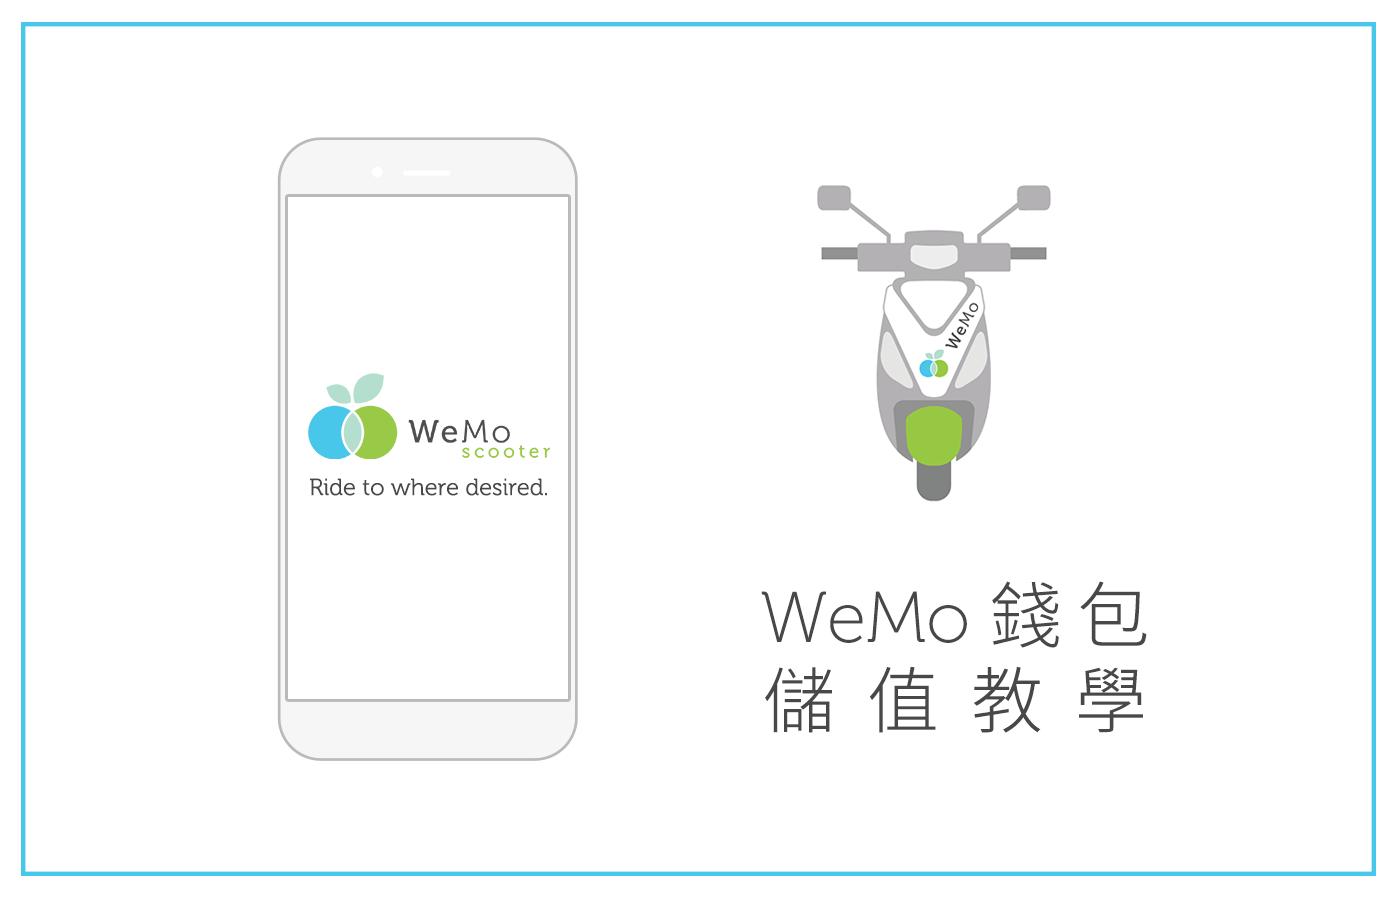 WeMo Scooter 錢包 - 儲值教學